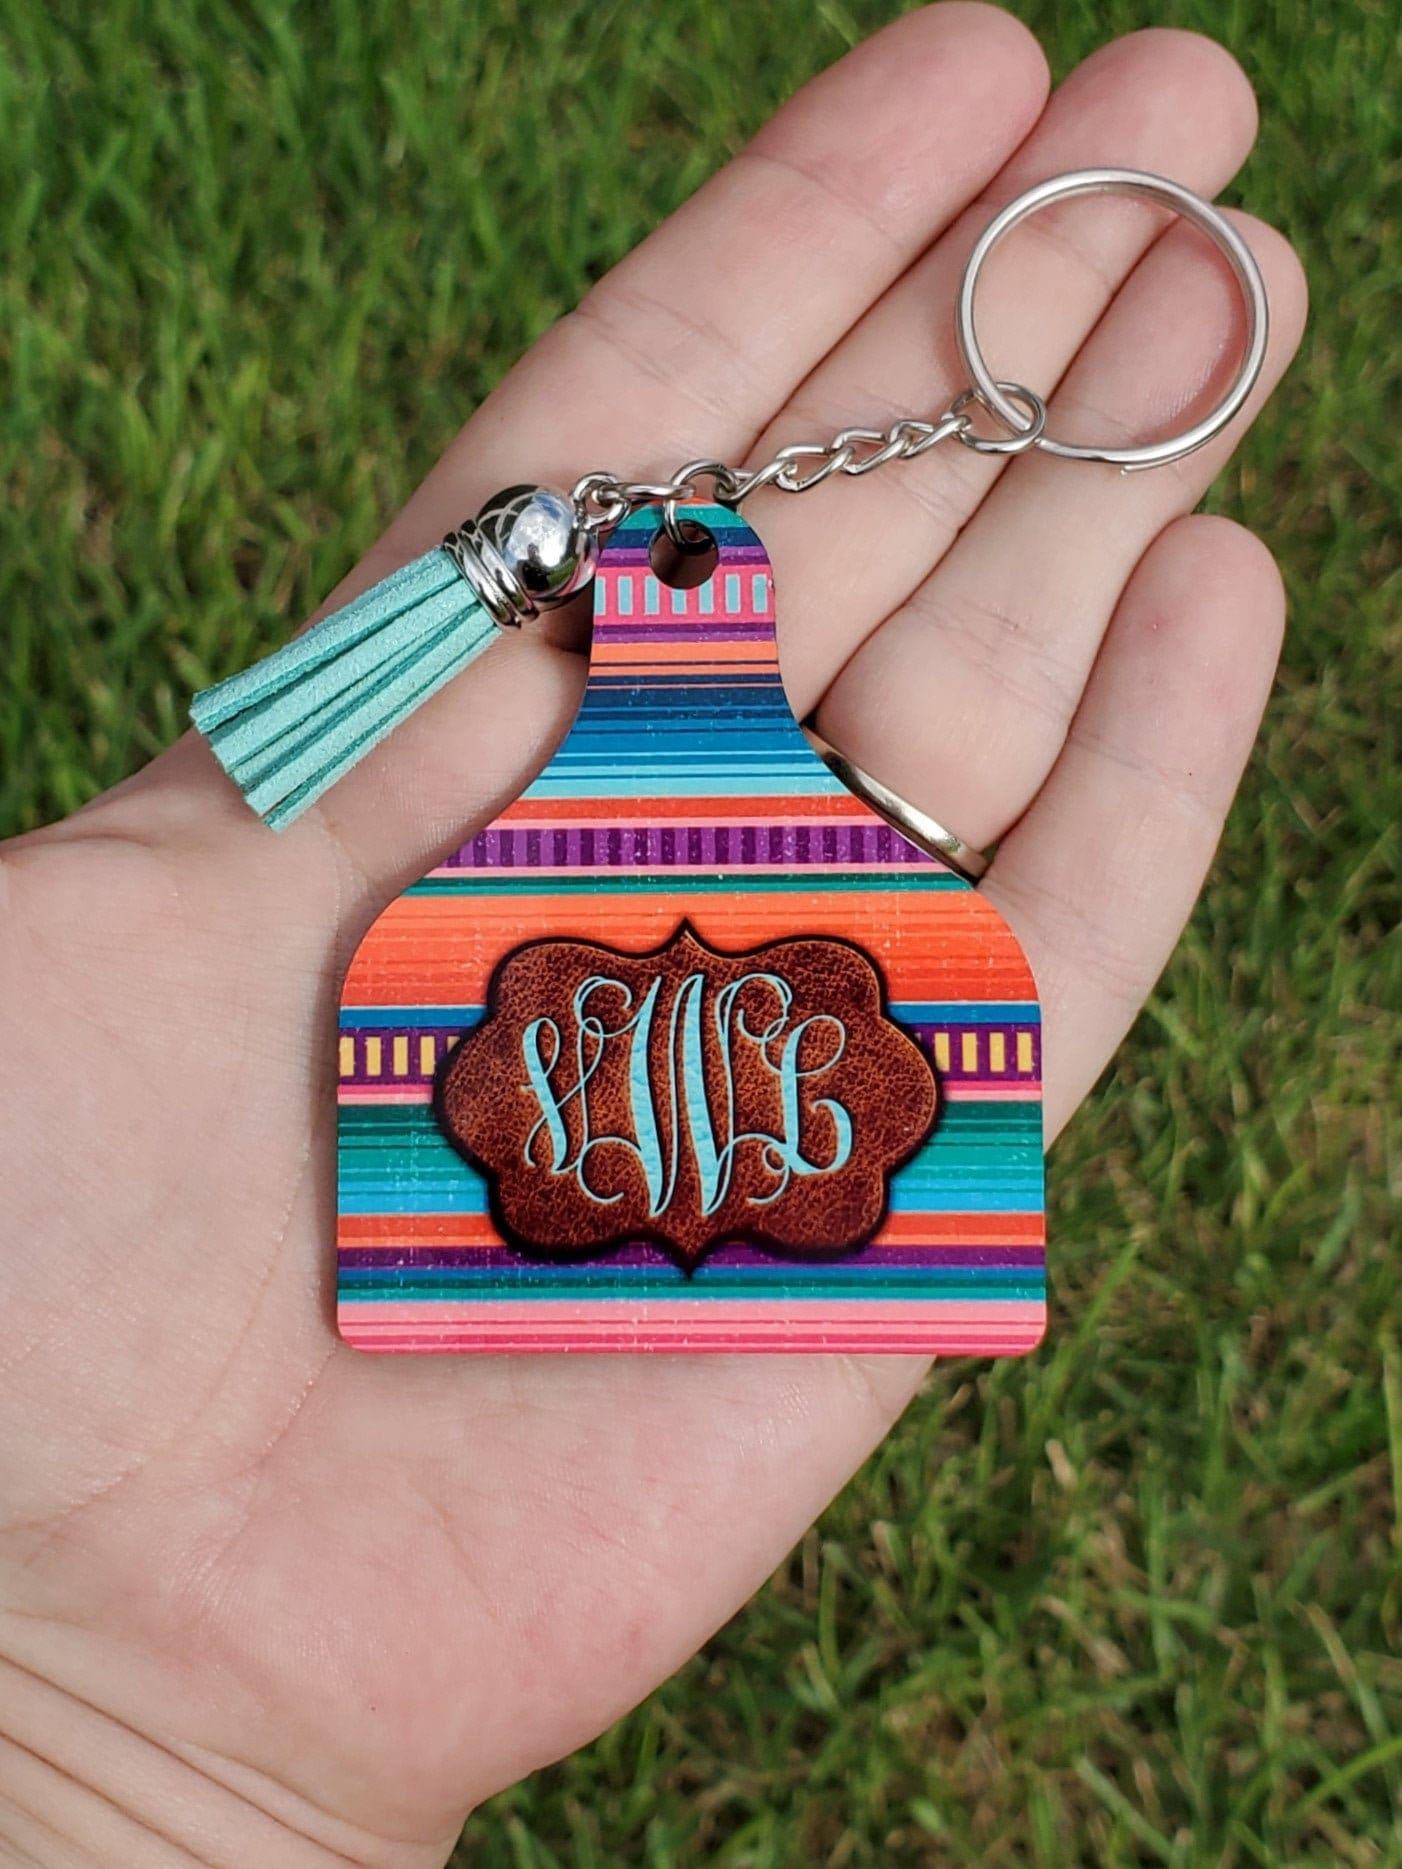 Personalized Cow Ear Tag Keychain, Pink Serape, Rosado, Monogram, Cattle livestock, Serape Keychain, Branded Leather, Stocking Stuffer, gift